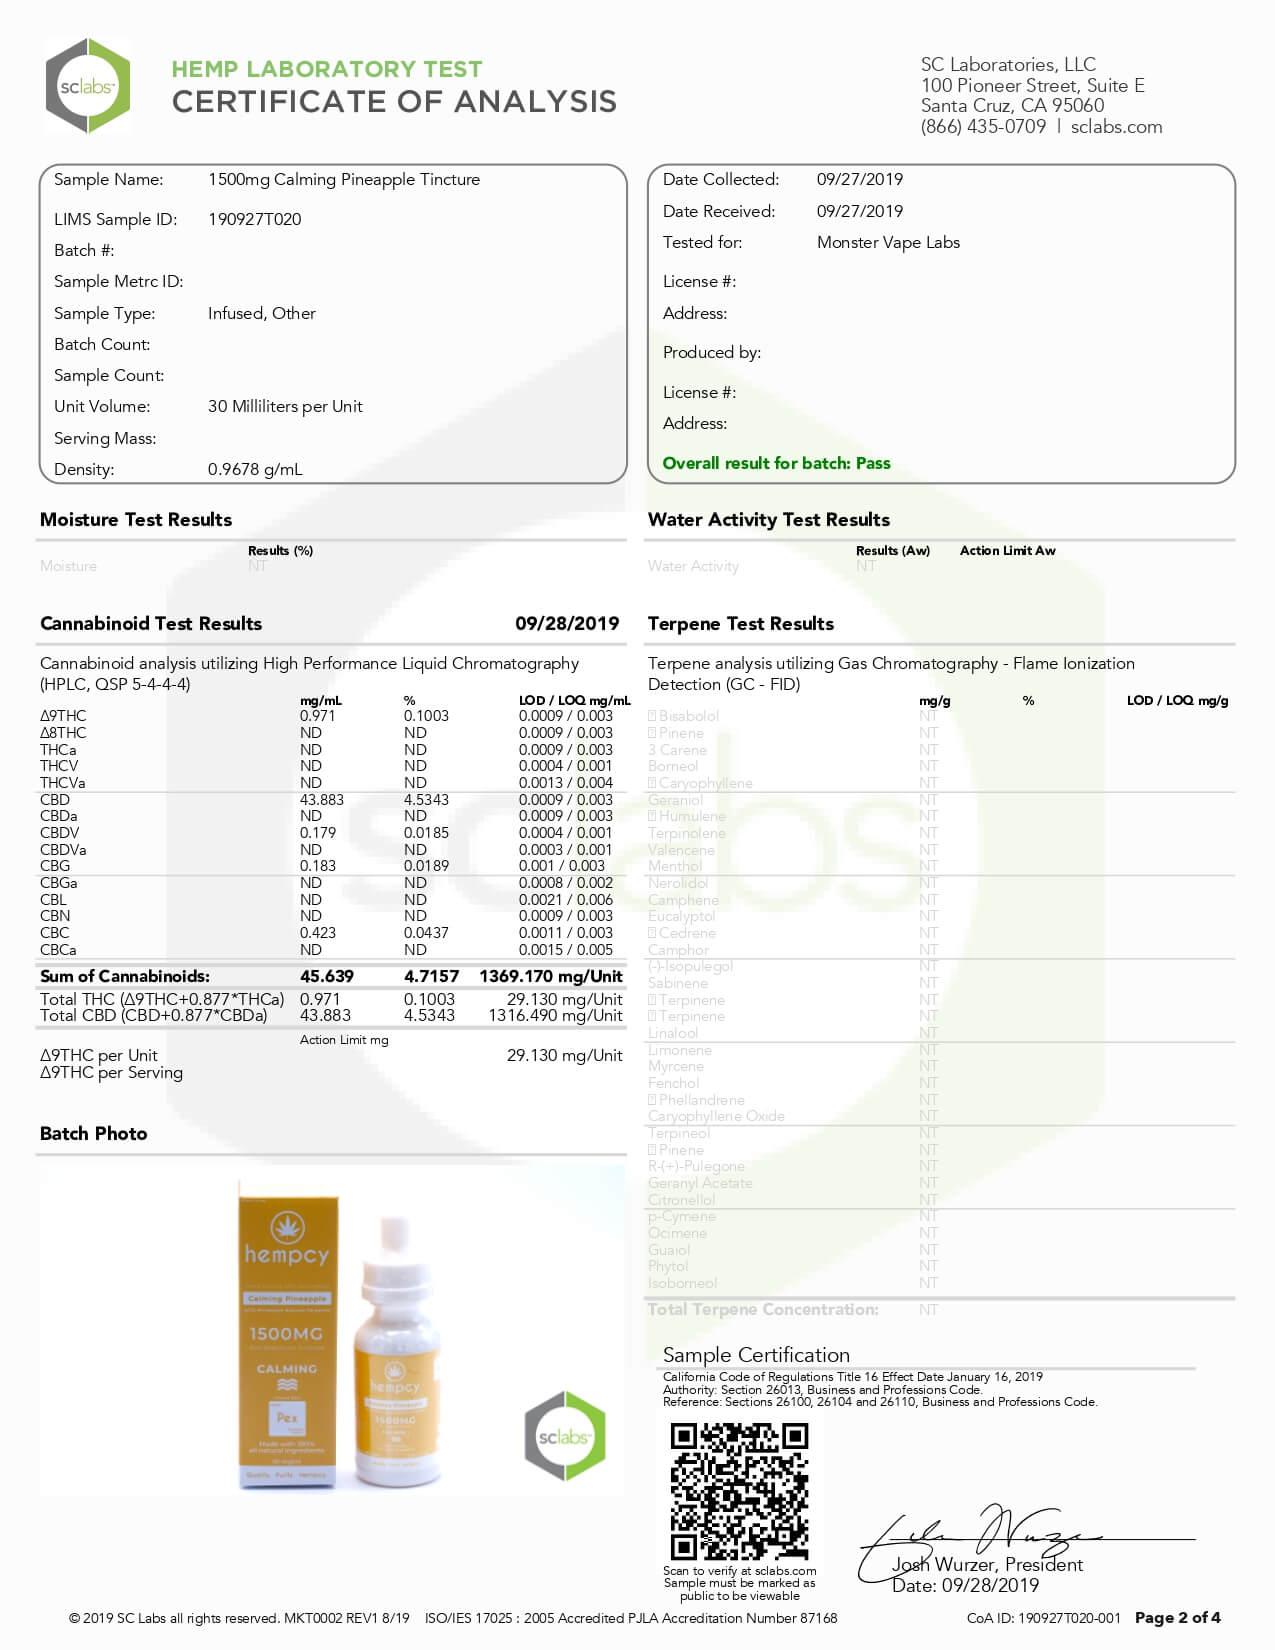 Hempcy CBD Tincture Calming Pineapple 1500mg Lab Report